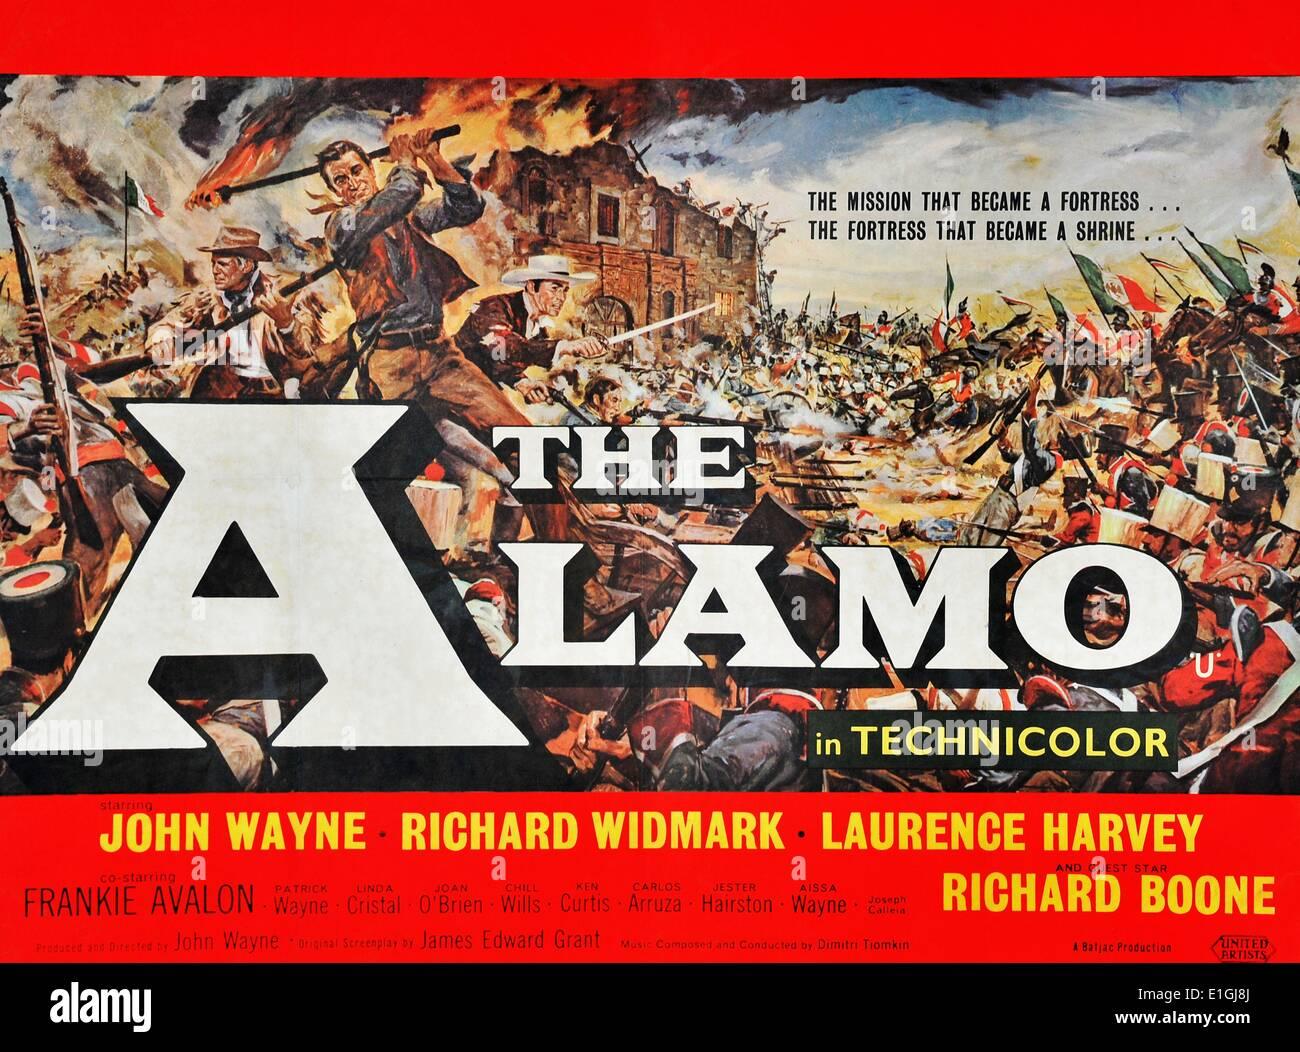 'The Alamo' starring John Wayne, Richard Widmark, Laurence Harvey and Richard Boone. The Battle of the Alamo (February 23 – - Stock Image